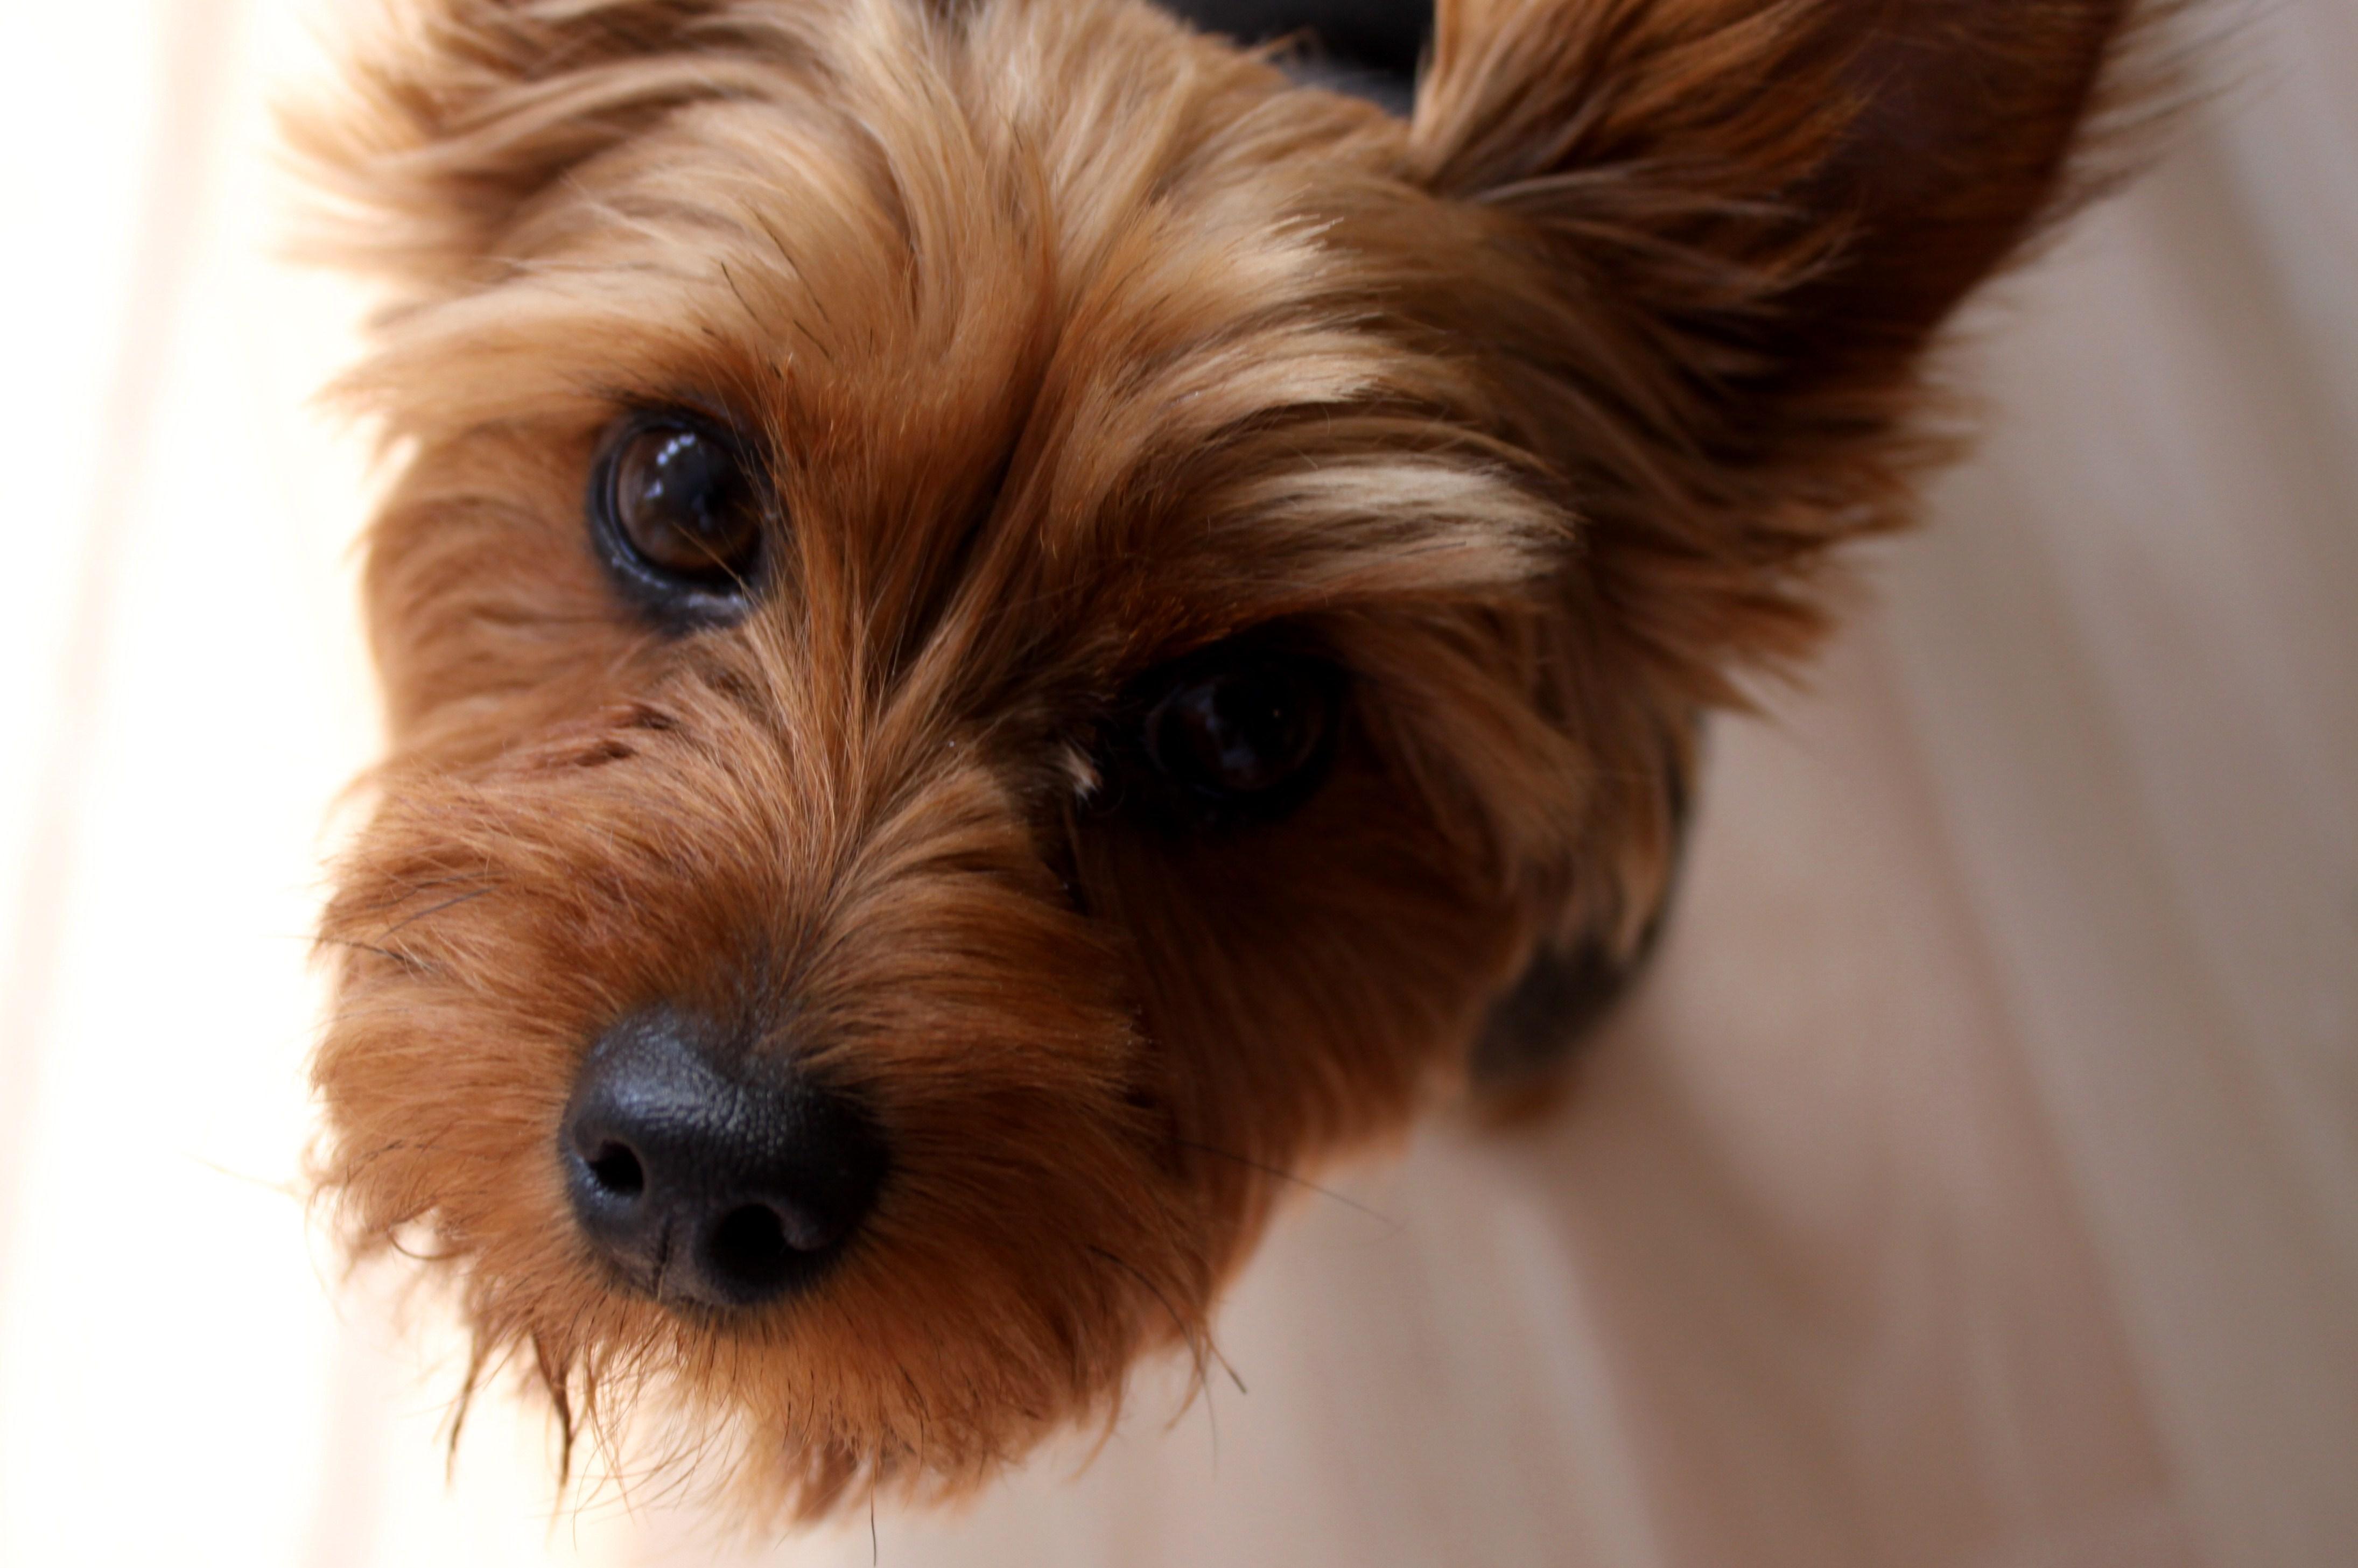 Yorkie And Dachshund Mix Pomeranian/dachshund mix